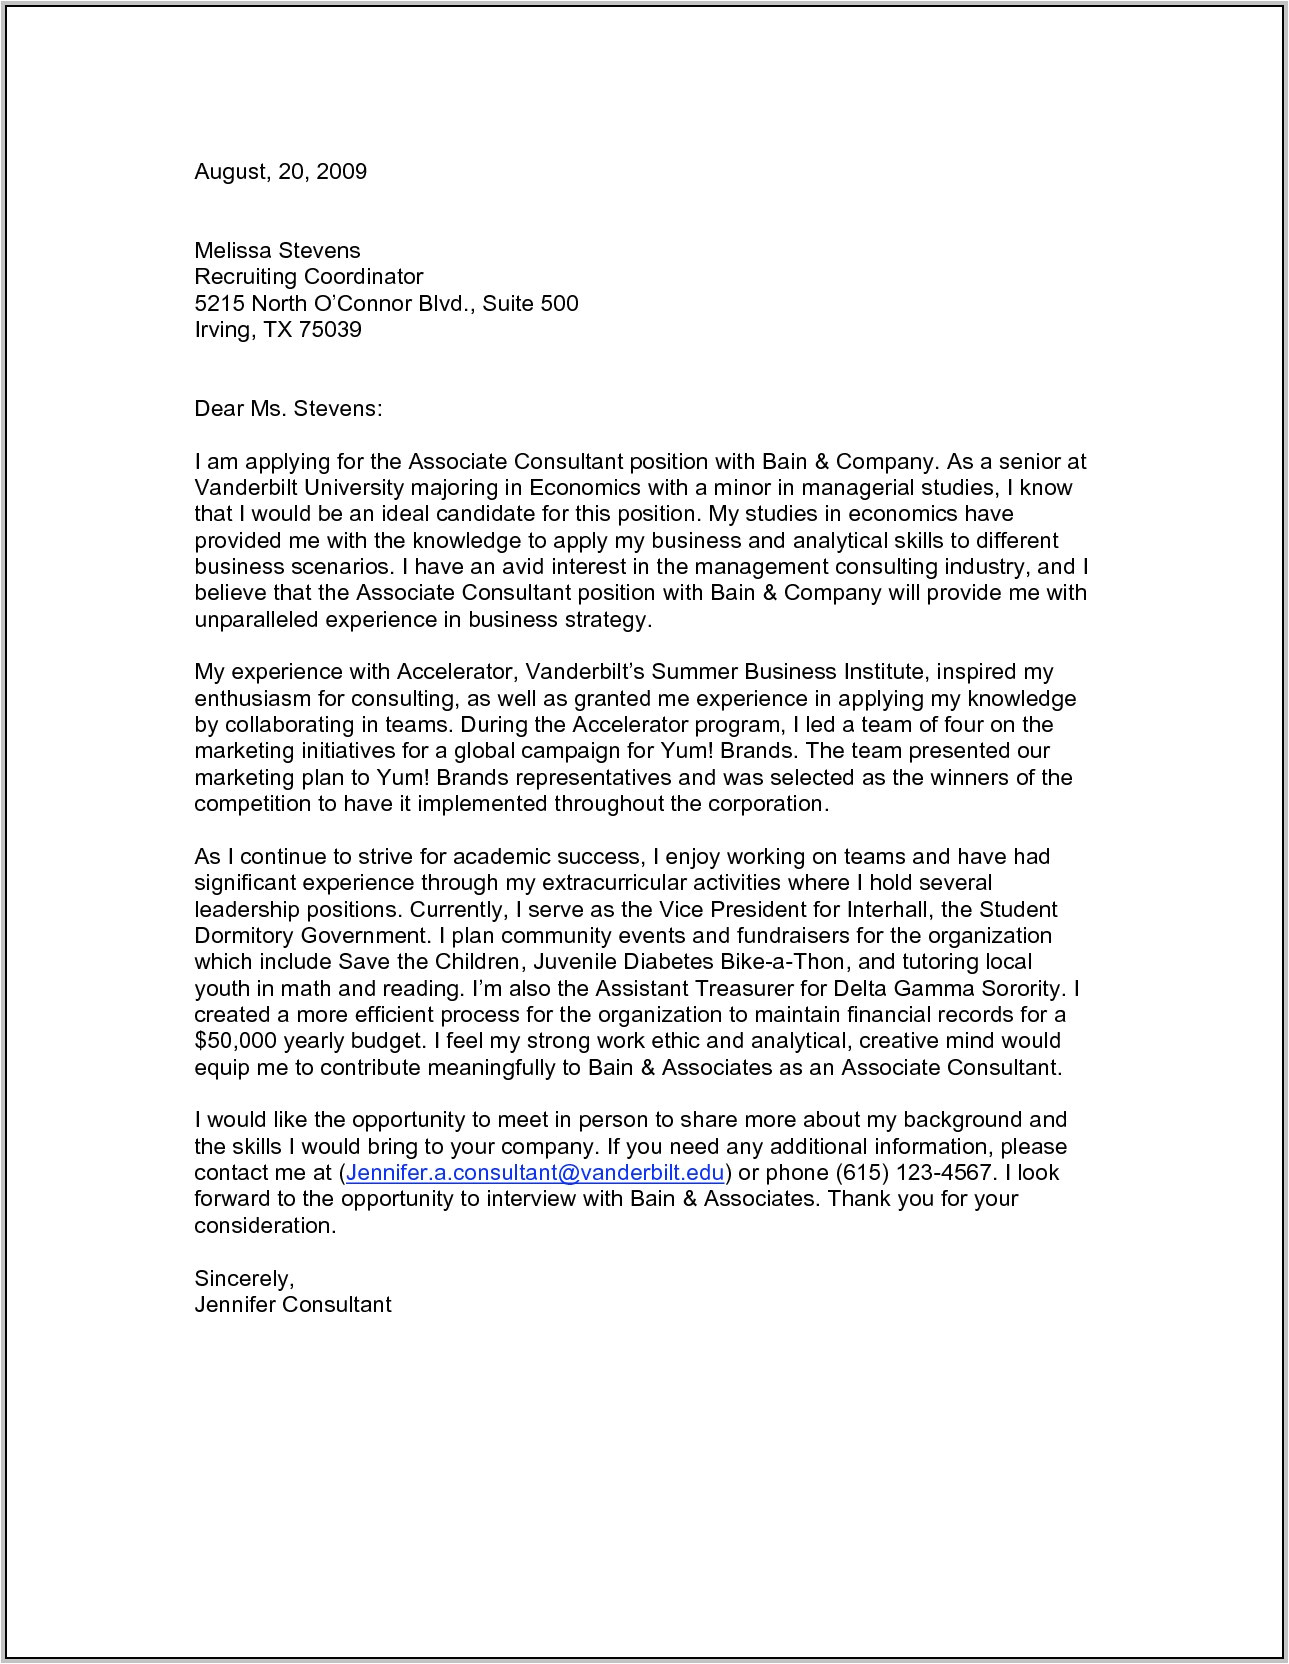 cover letter job recruitment consultant 4015